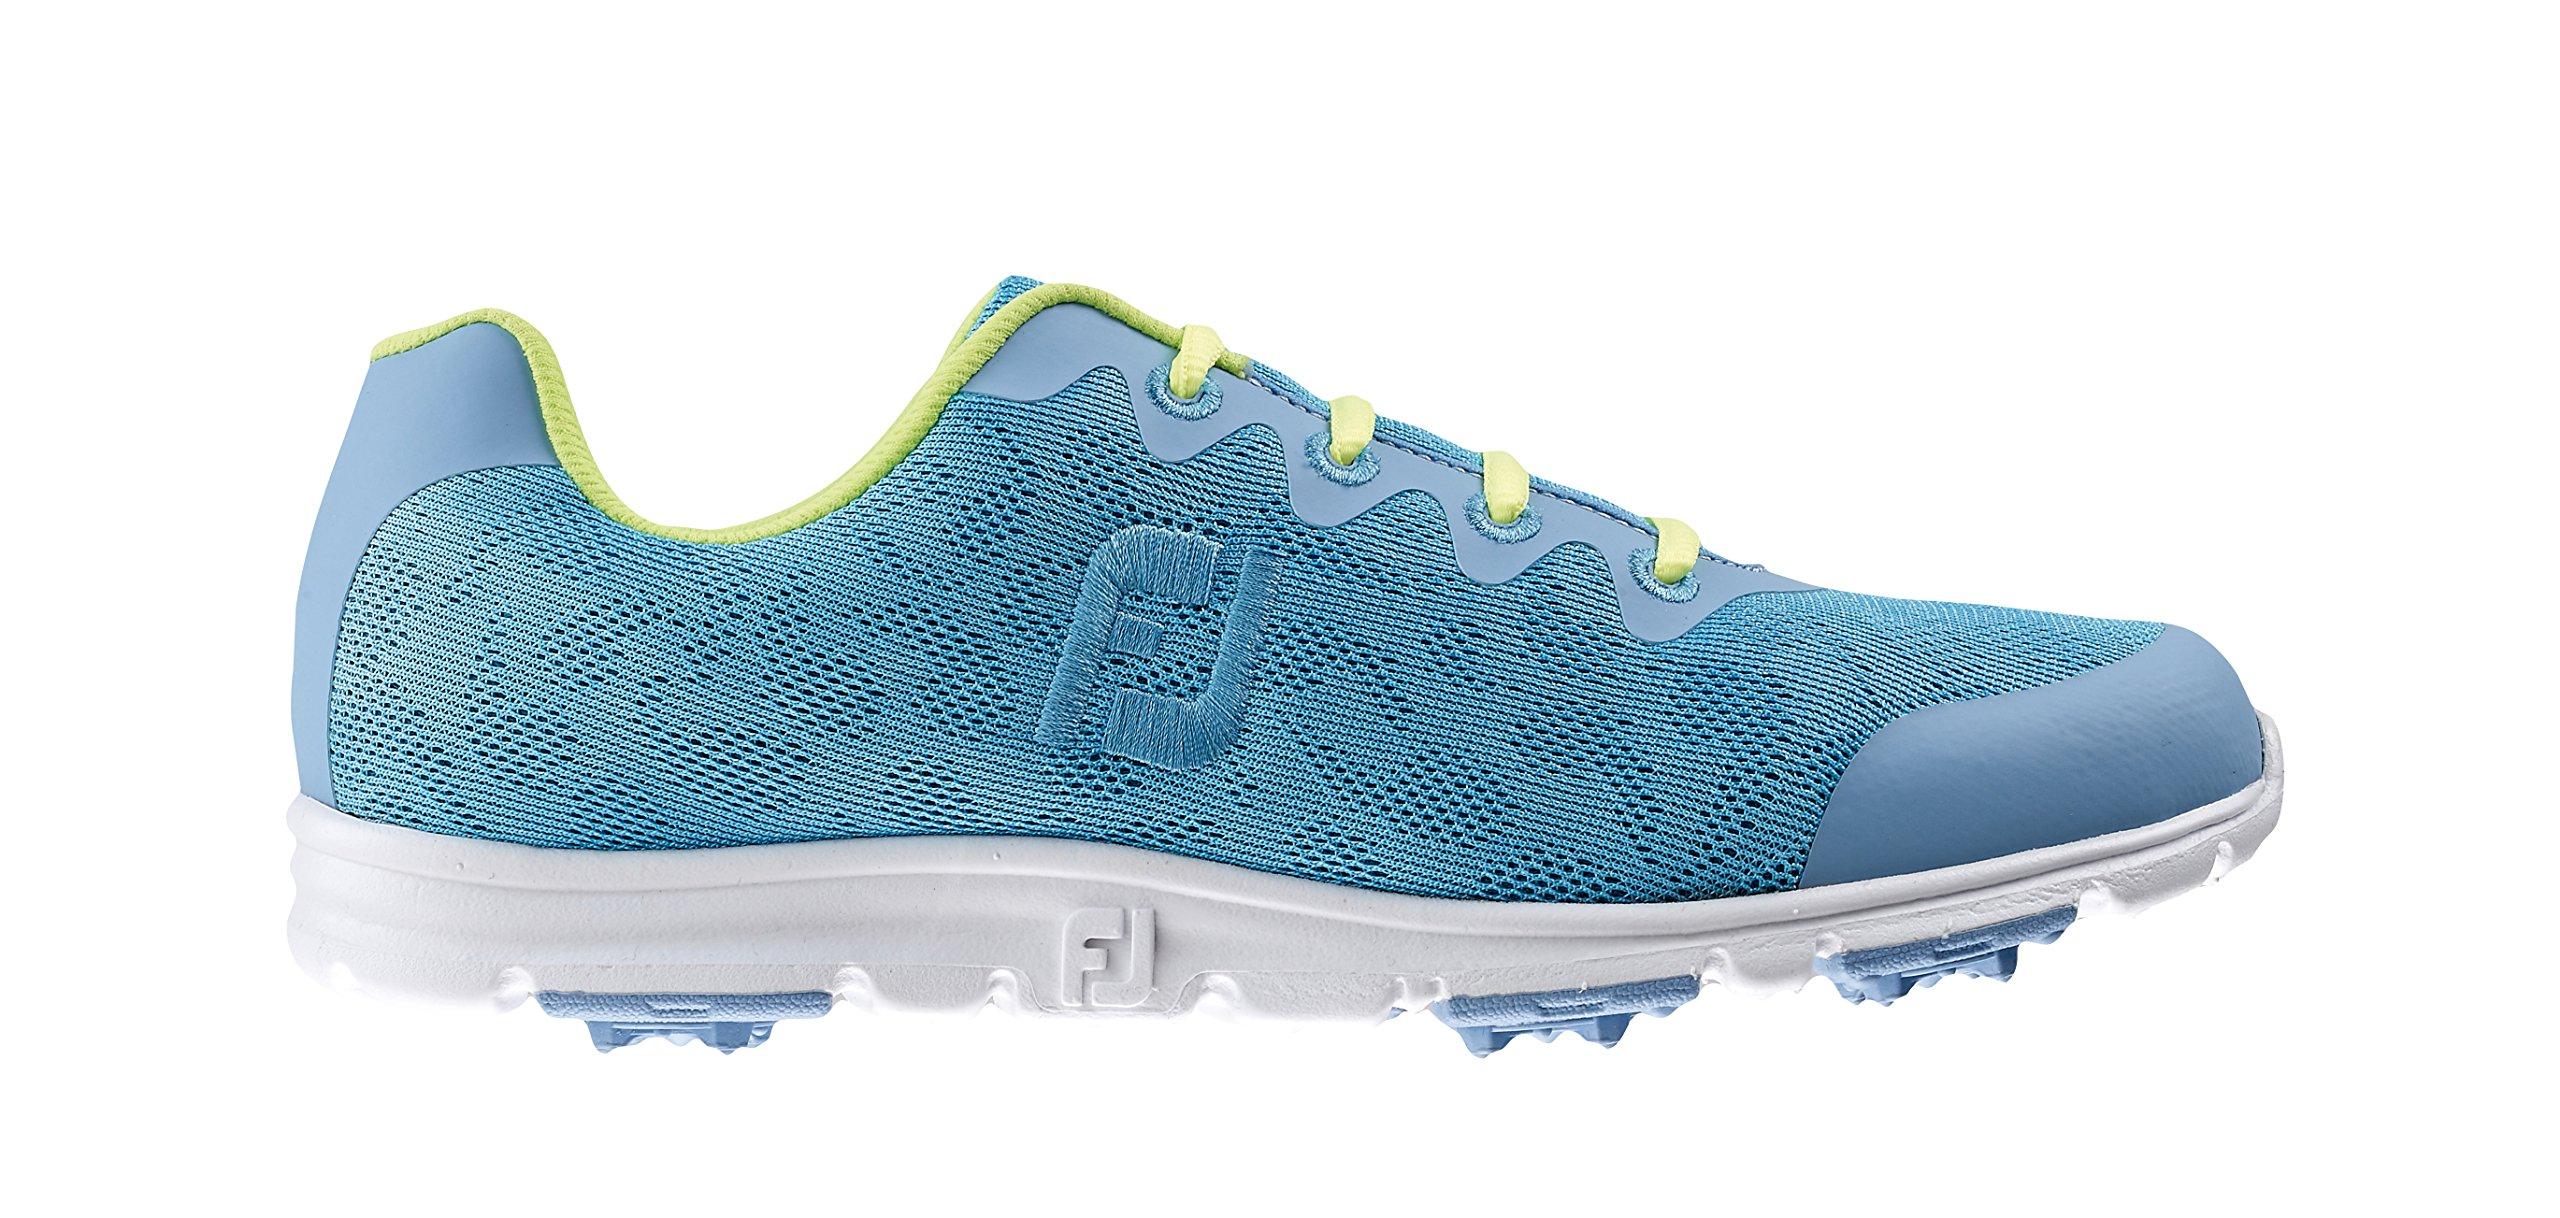 FootJoy Enjoy Spikeless Golf Shoes CLOSEOUT Women Pool Blue Medium 6